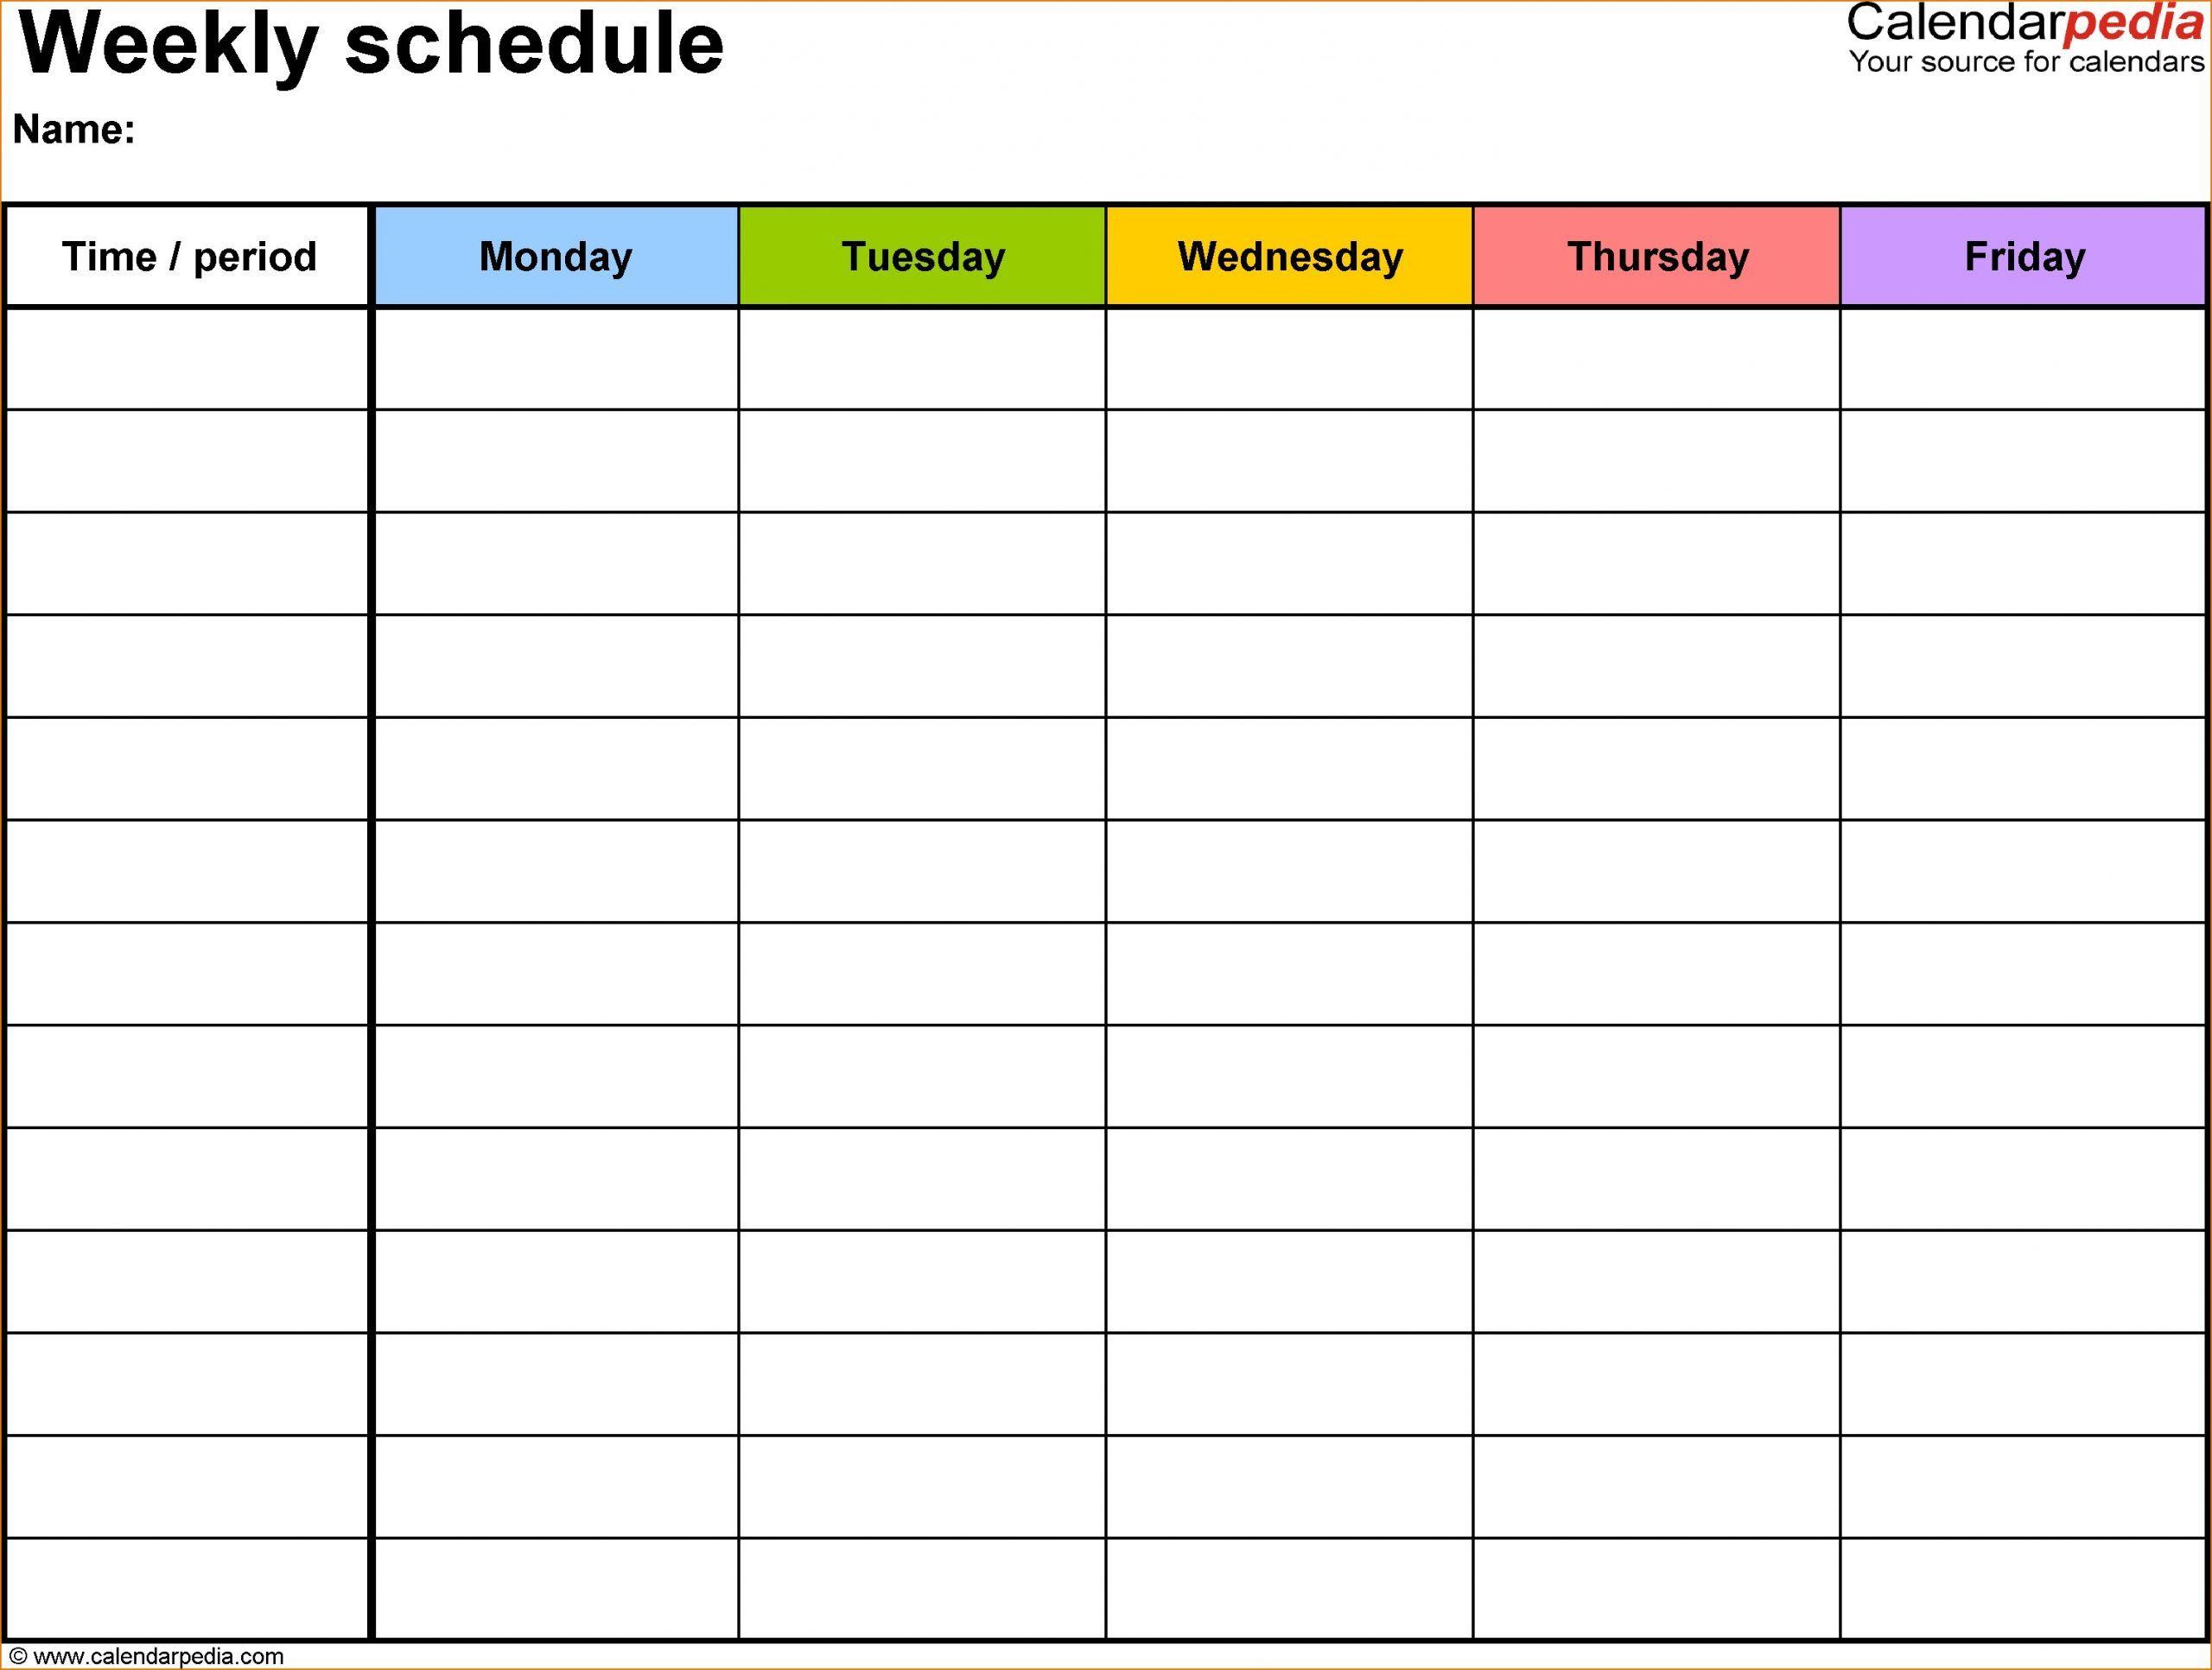 Free calendar maker Useful